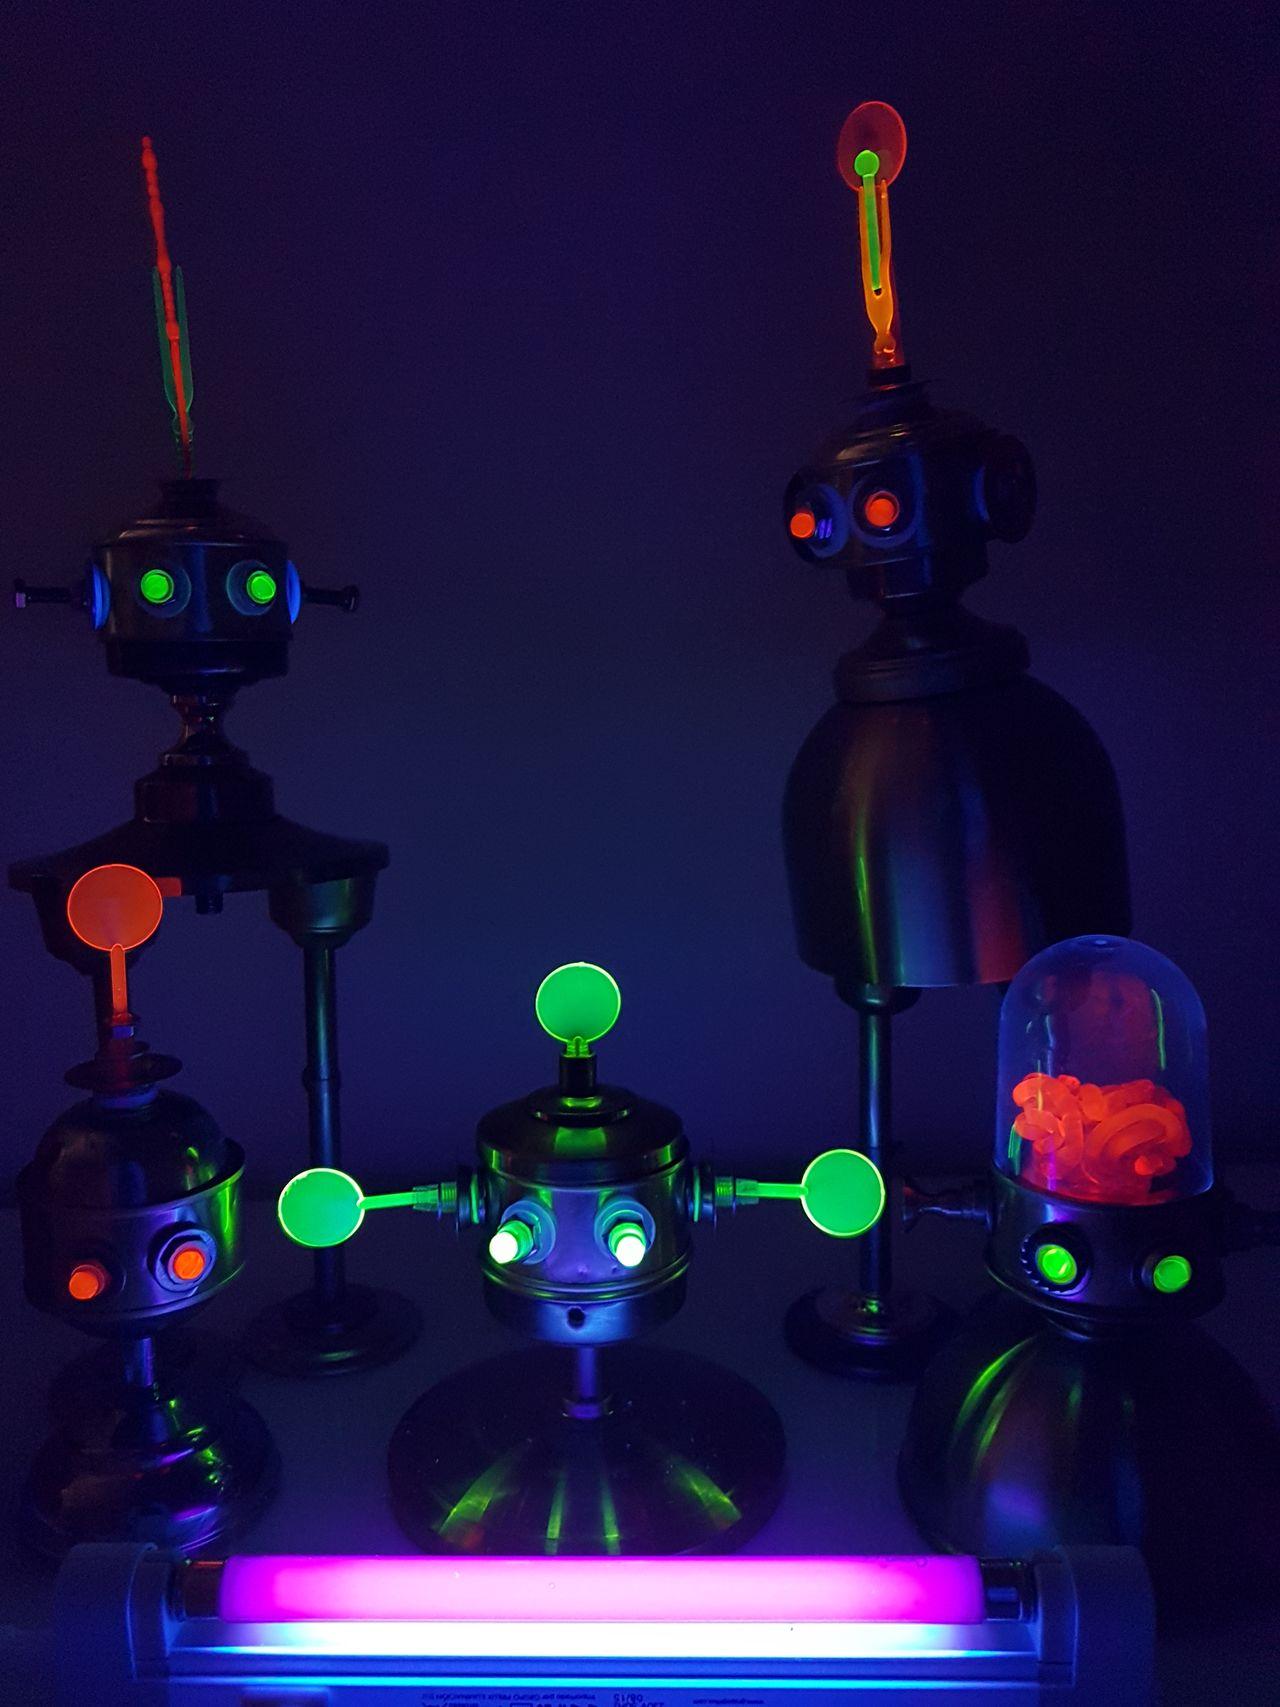 Fluo bots Music Dark No People Technology Indoors  Clock Neon Robots Art Dark Light Lighting Fluorescent Light Fluo  Fluorescent Colors